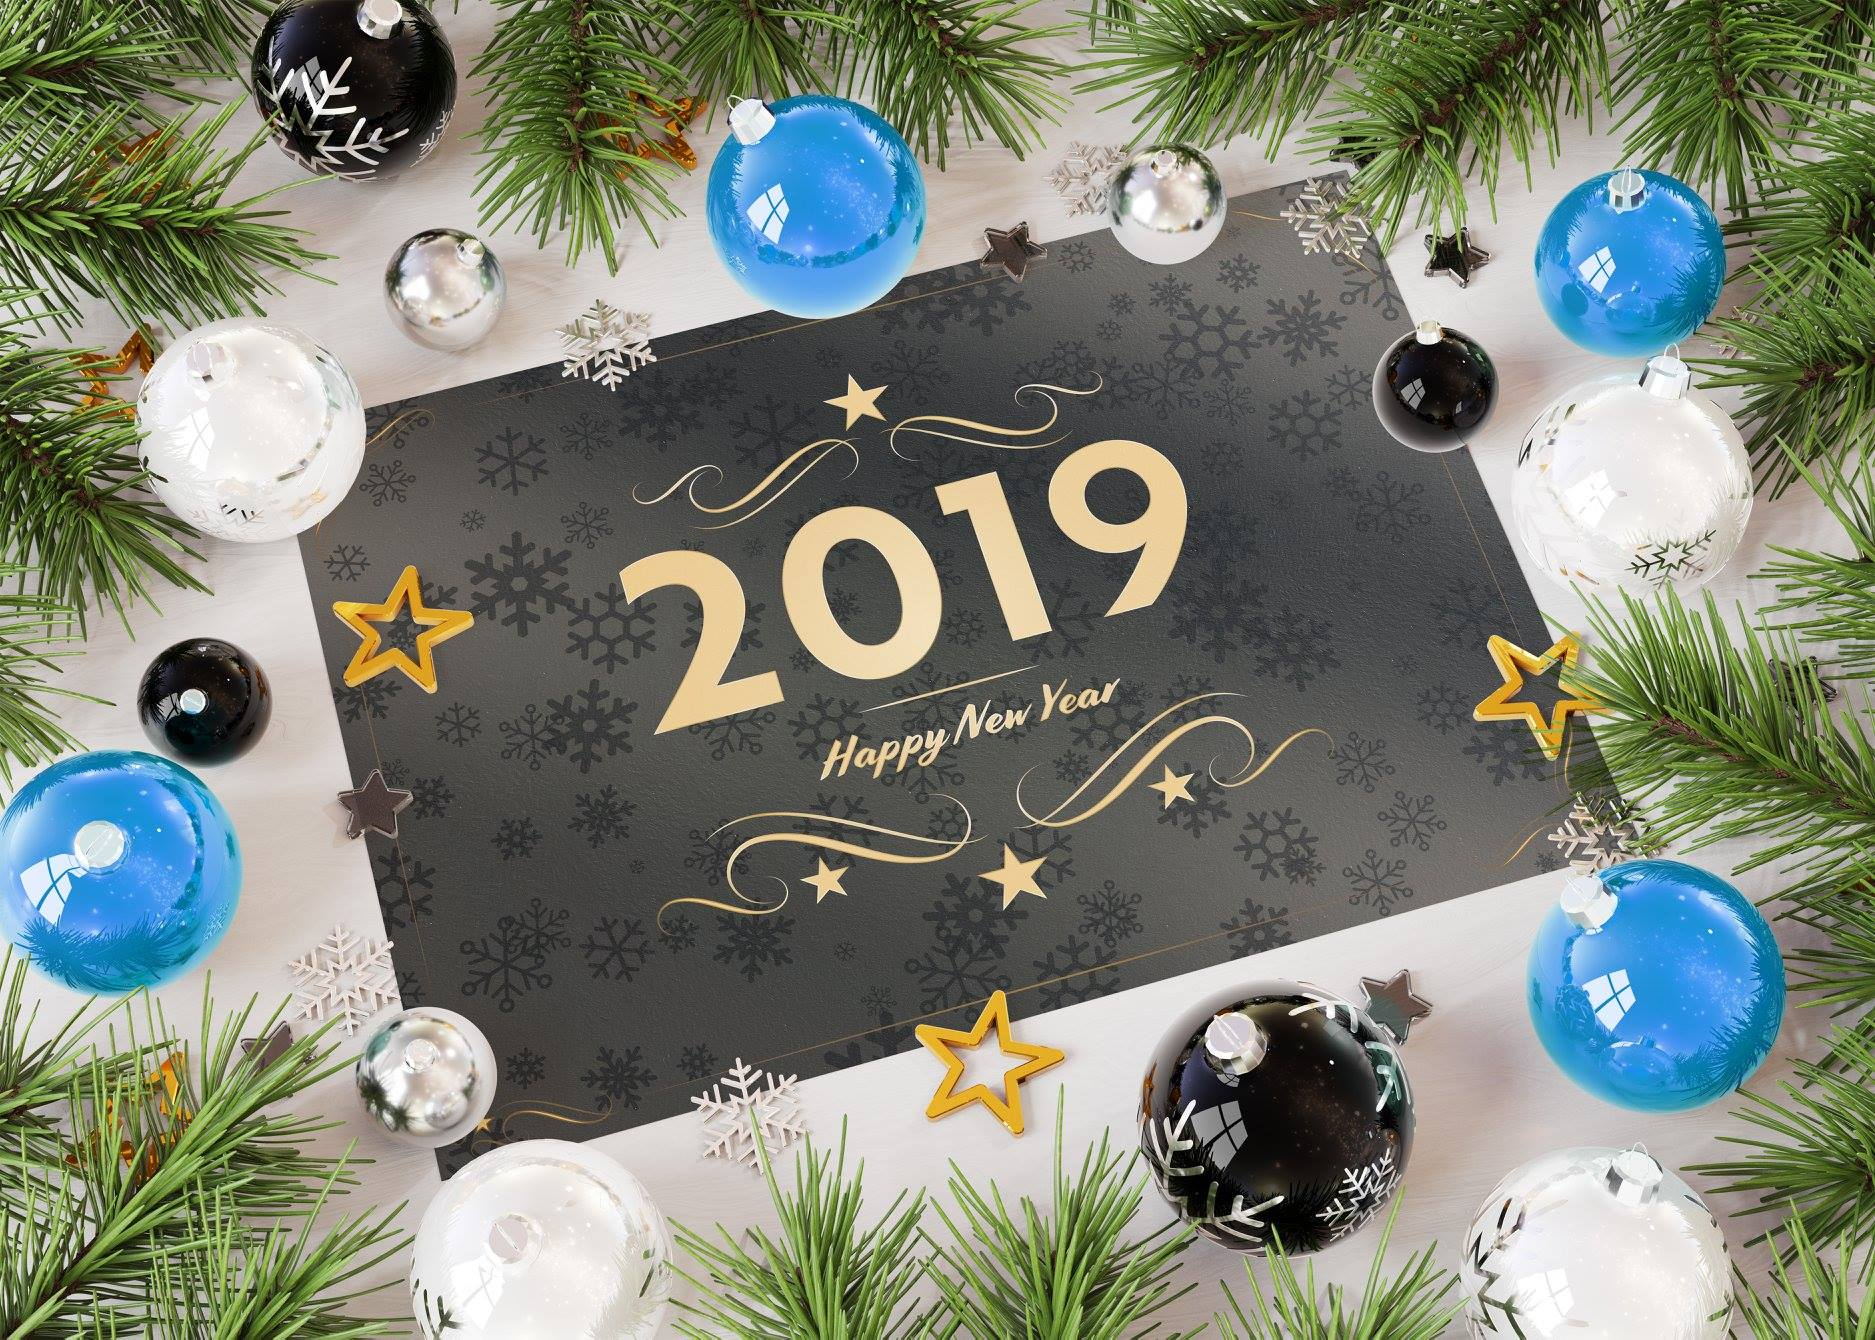 happy new year 2019 1 صور مكتوب عليها العام الجديد 2019